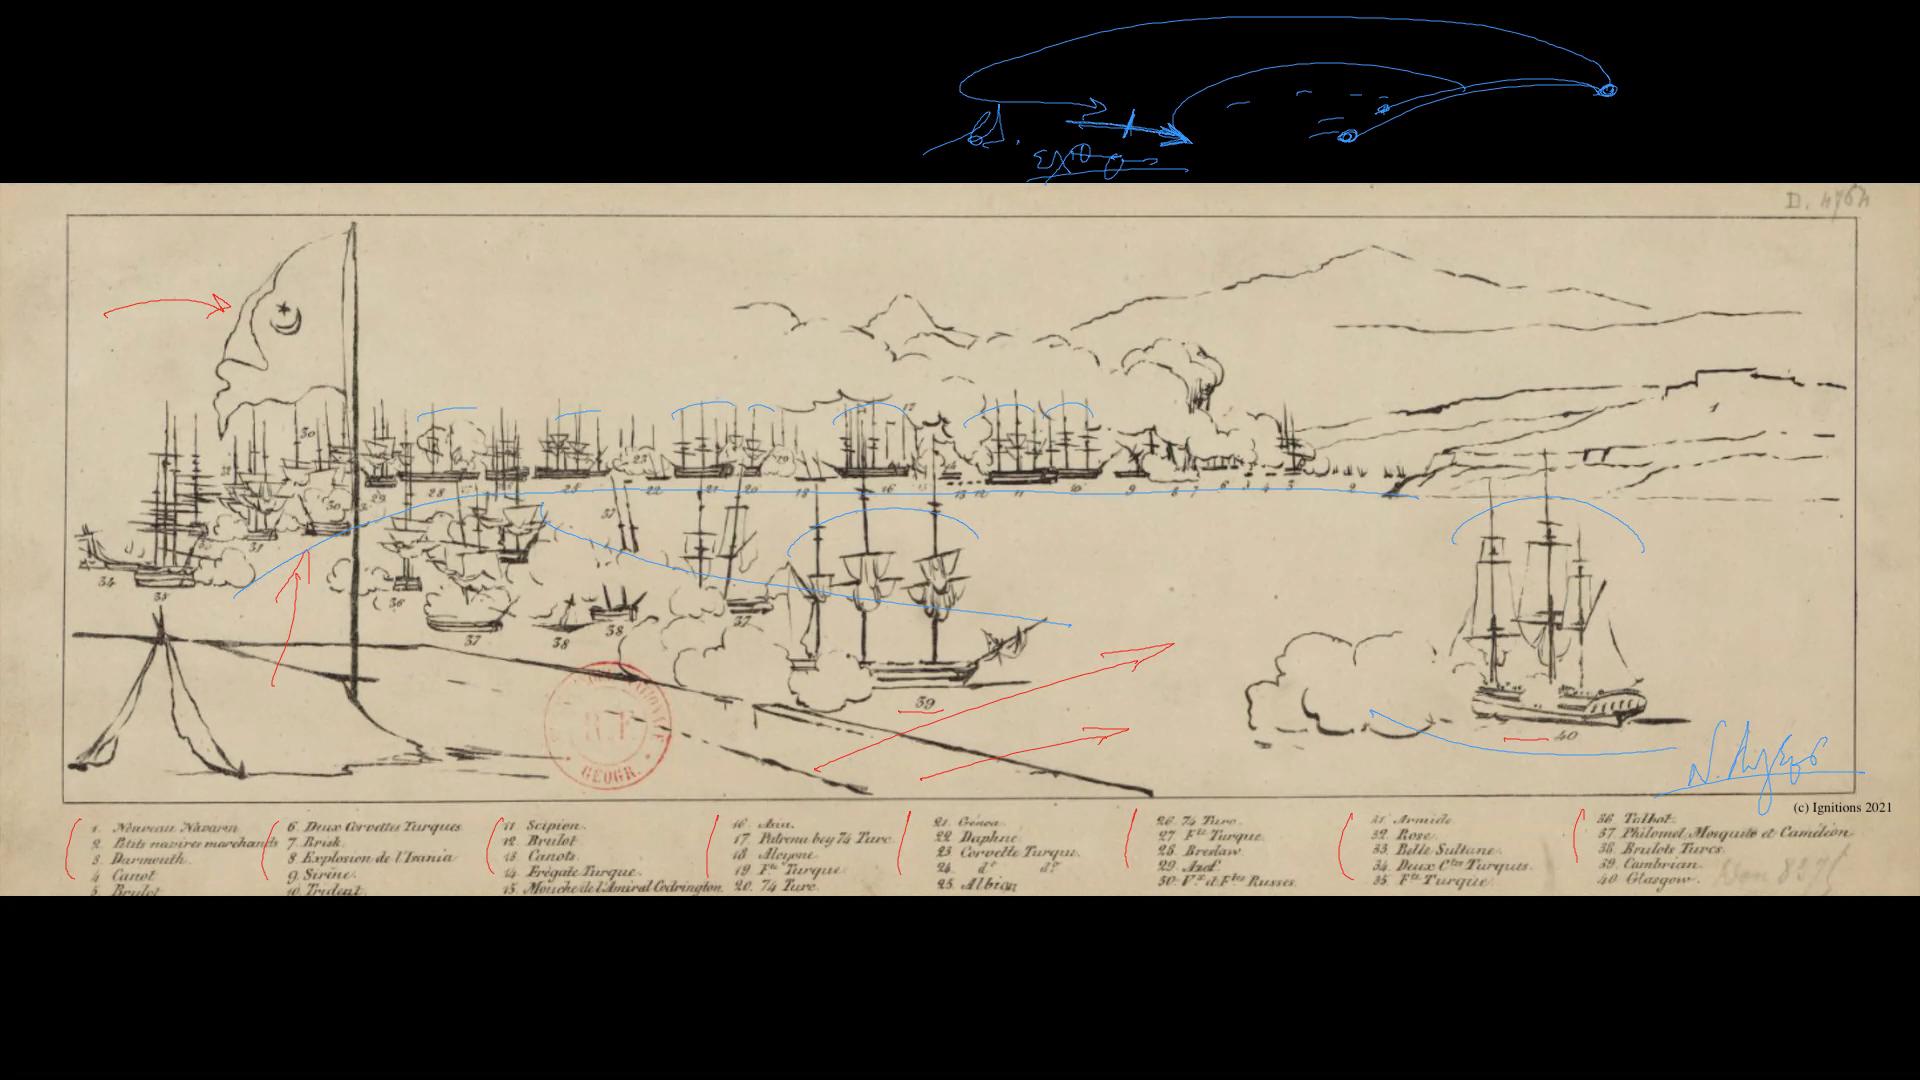 59213 - II - Ναυαρίνο: Η θαλάσσια Απελευθέρωση. Επανάσταση VI. (Dessin)